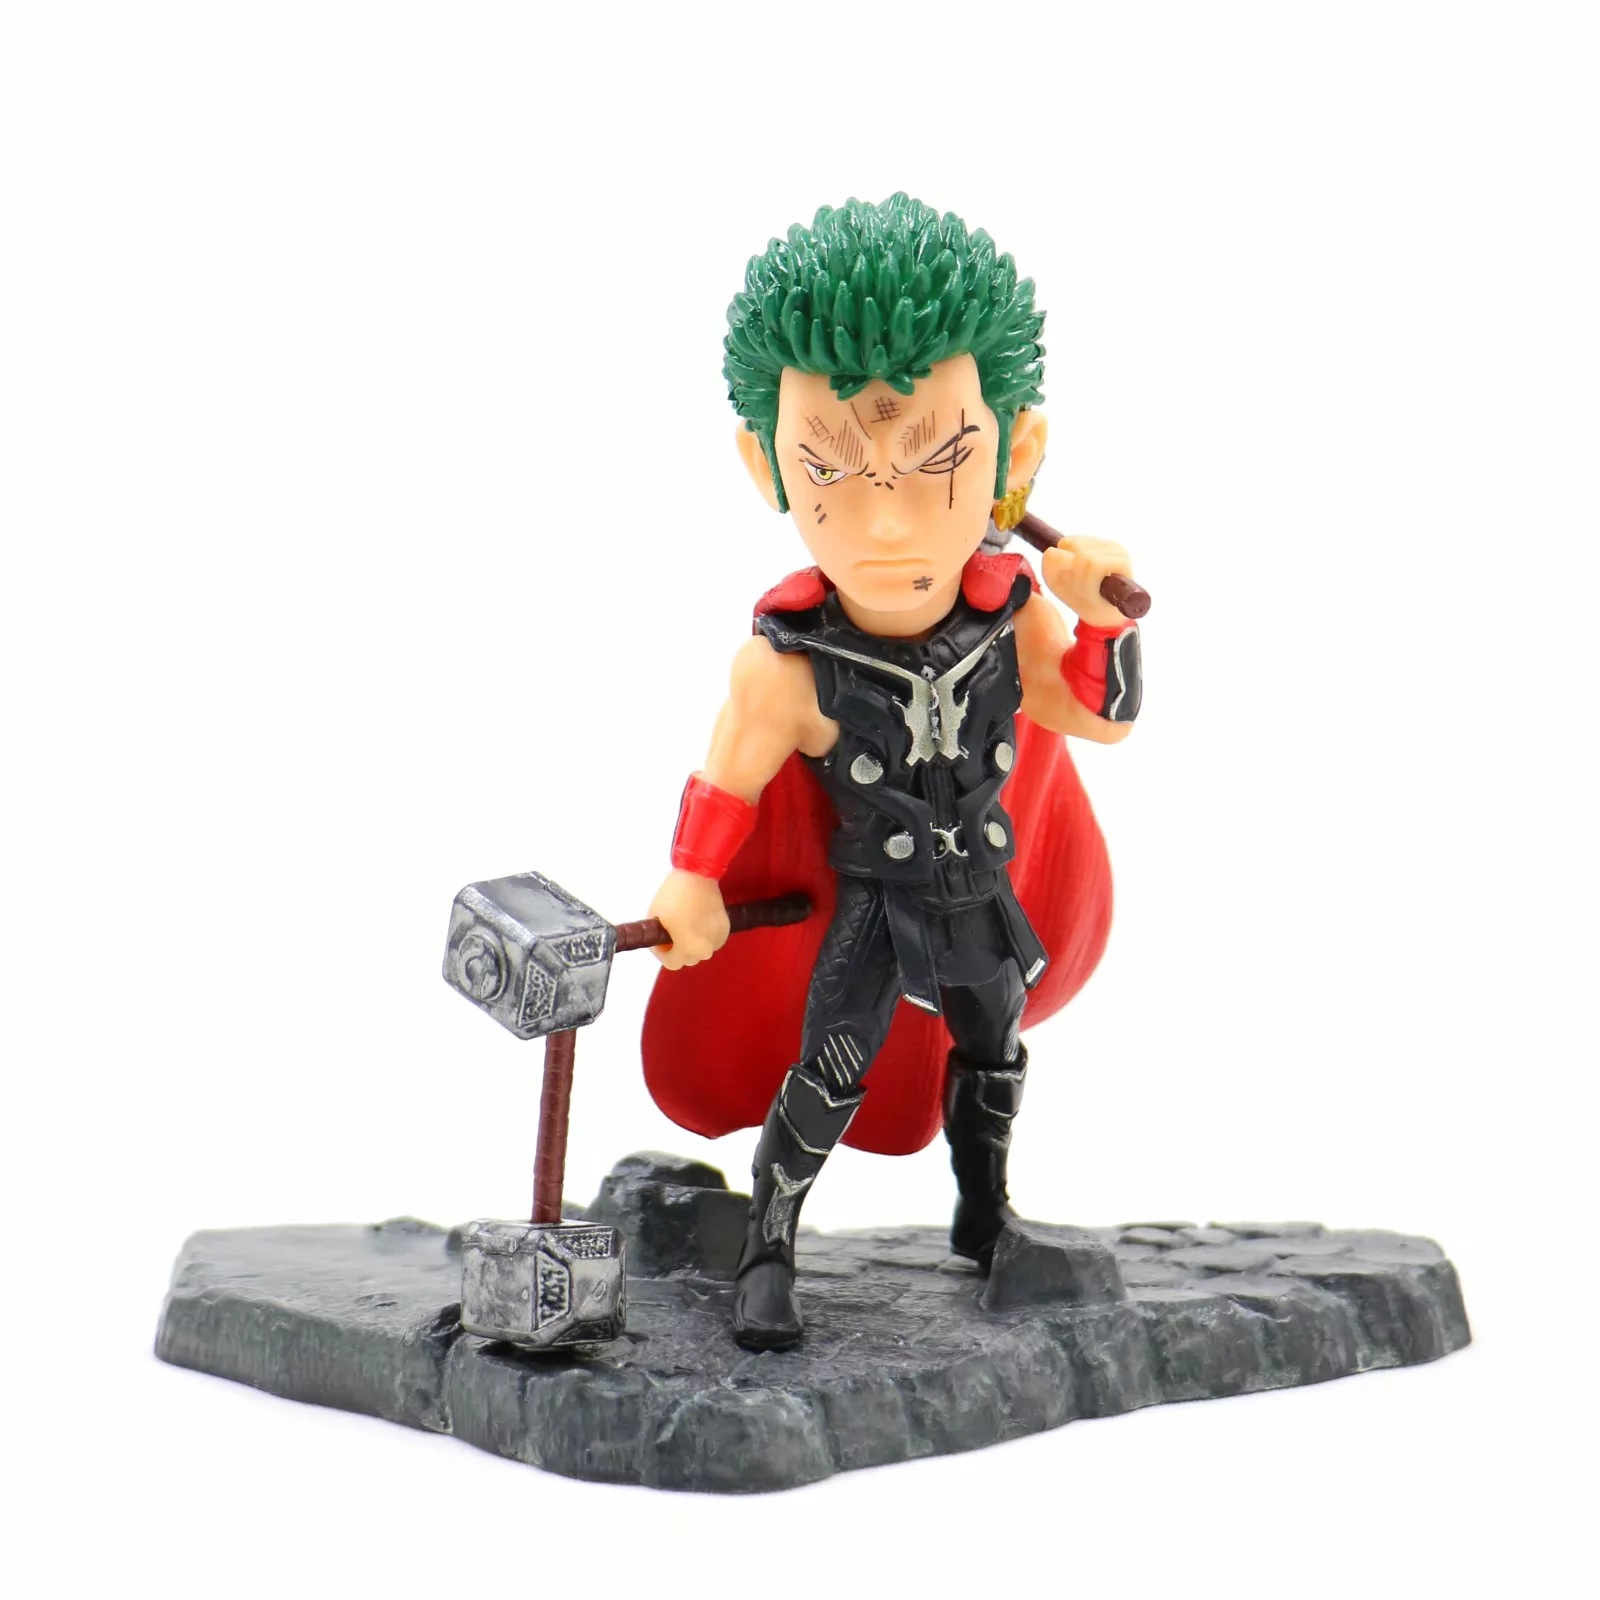 Anime One Piece 12cm Roronoa Zoro as Thor Ver. Action Figure Collection Model Toys